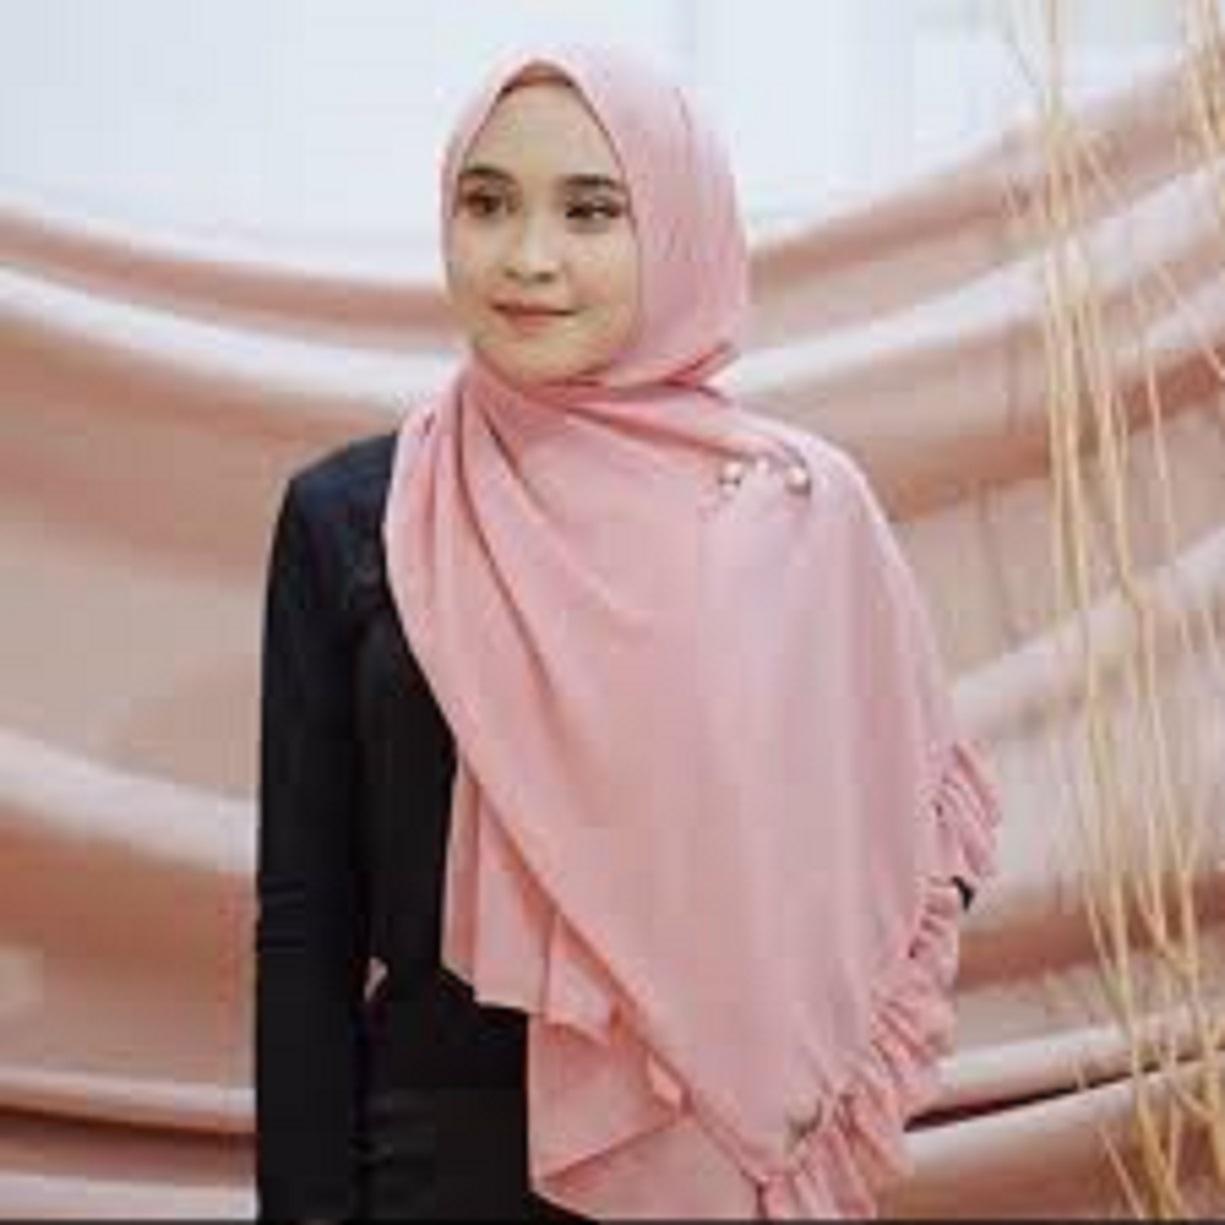 Eva Rempel Pashmina Diamond Italiano Jilbab Hijab Khimar Bergo Kerudung Lazada Indonesia